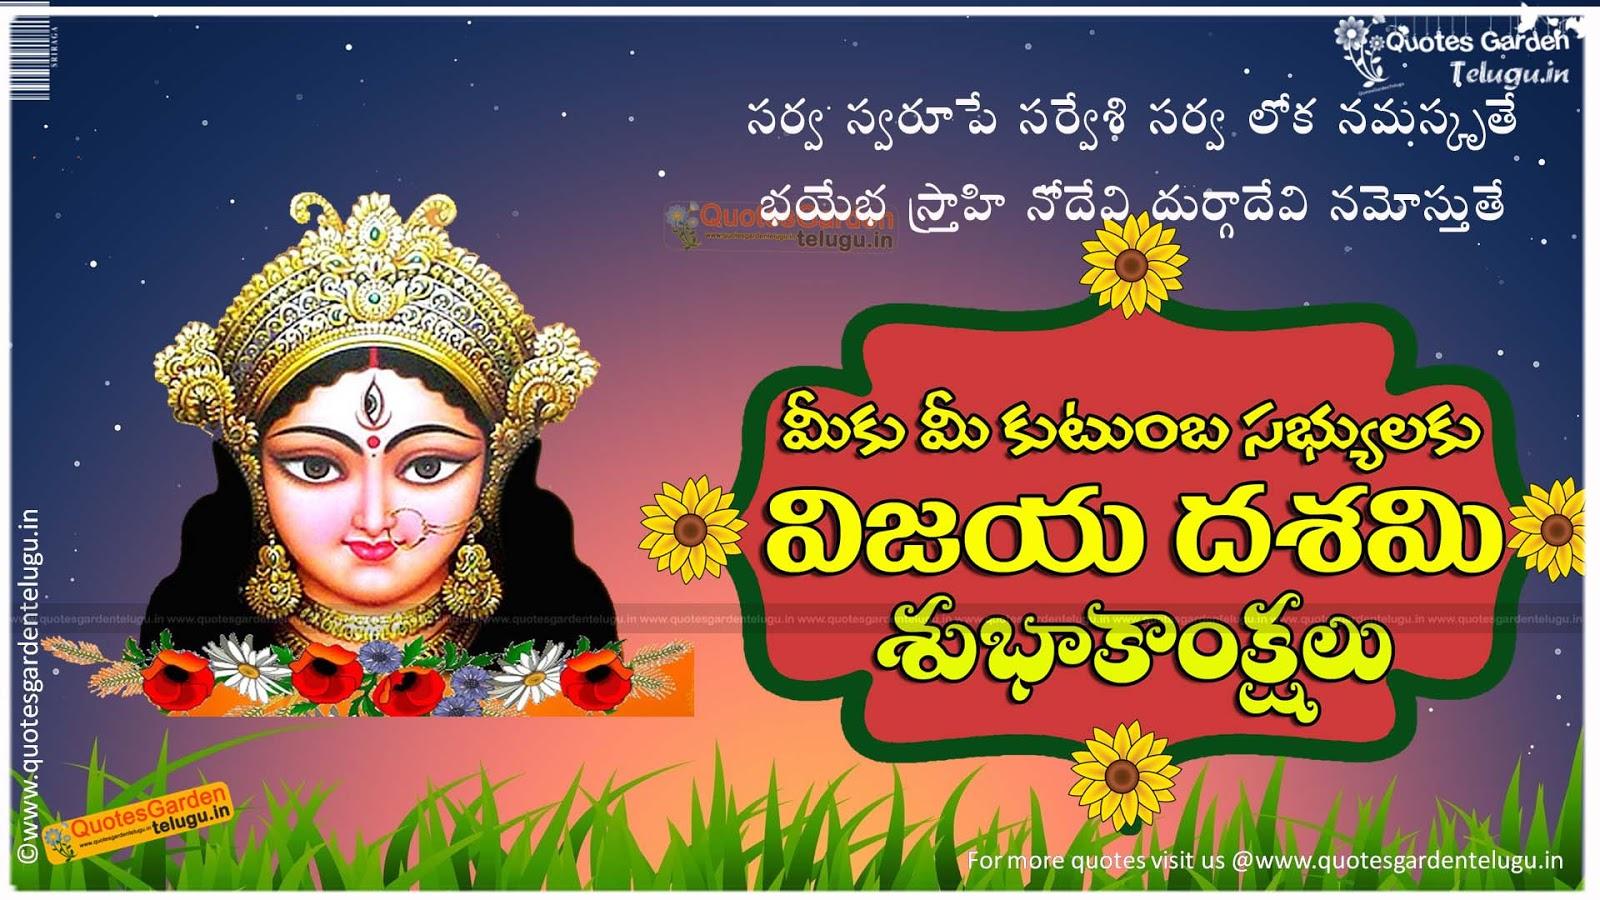 Dasara greetings in telugu for whatsapp quotes garden telugu dasara greetings in telugu m4hsunfo